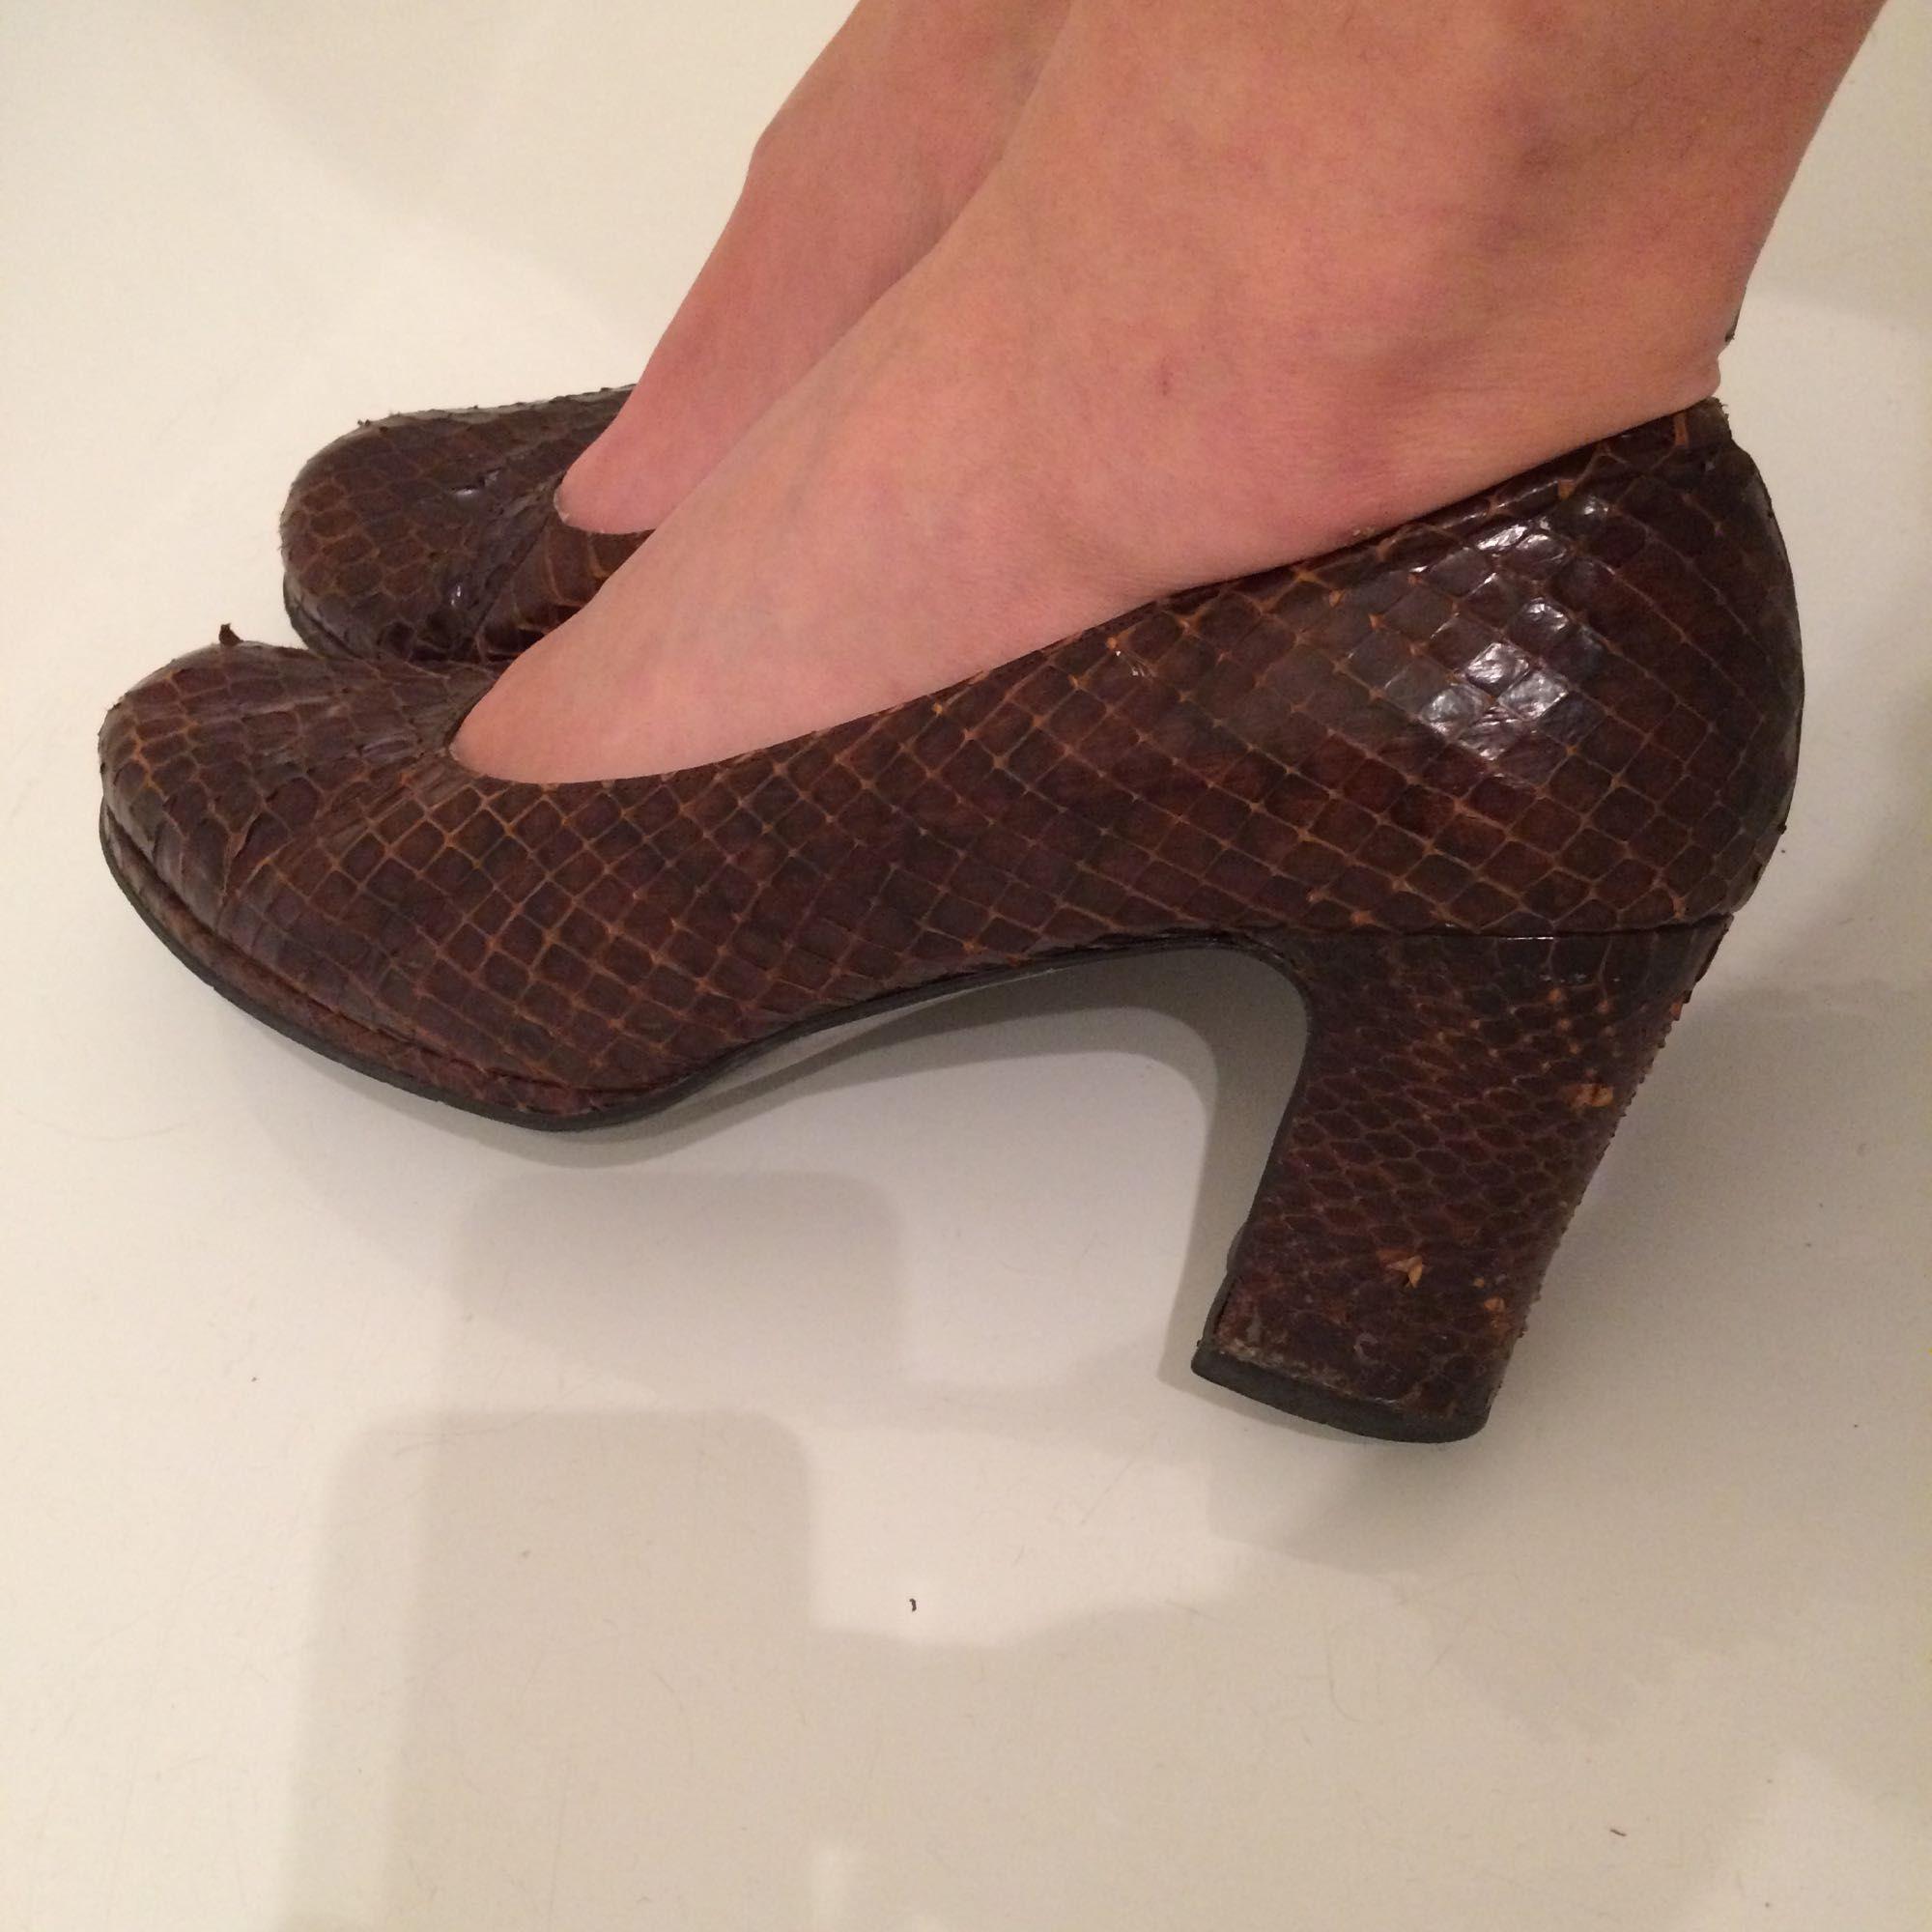 Äkta ormskinn skor! 6 cm klack - Skor - Second Hand 40690263370f7